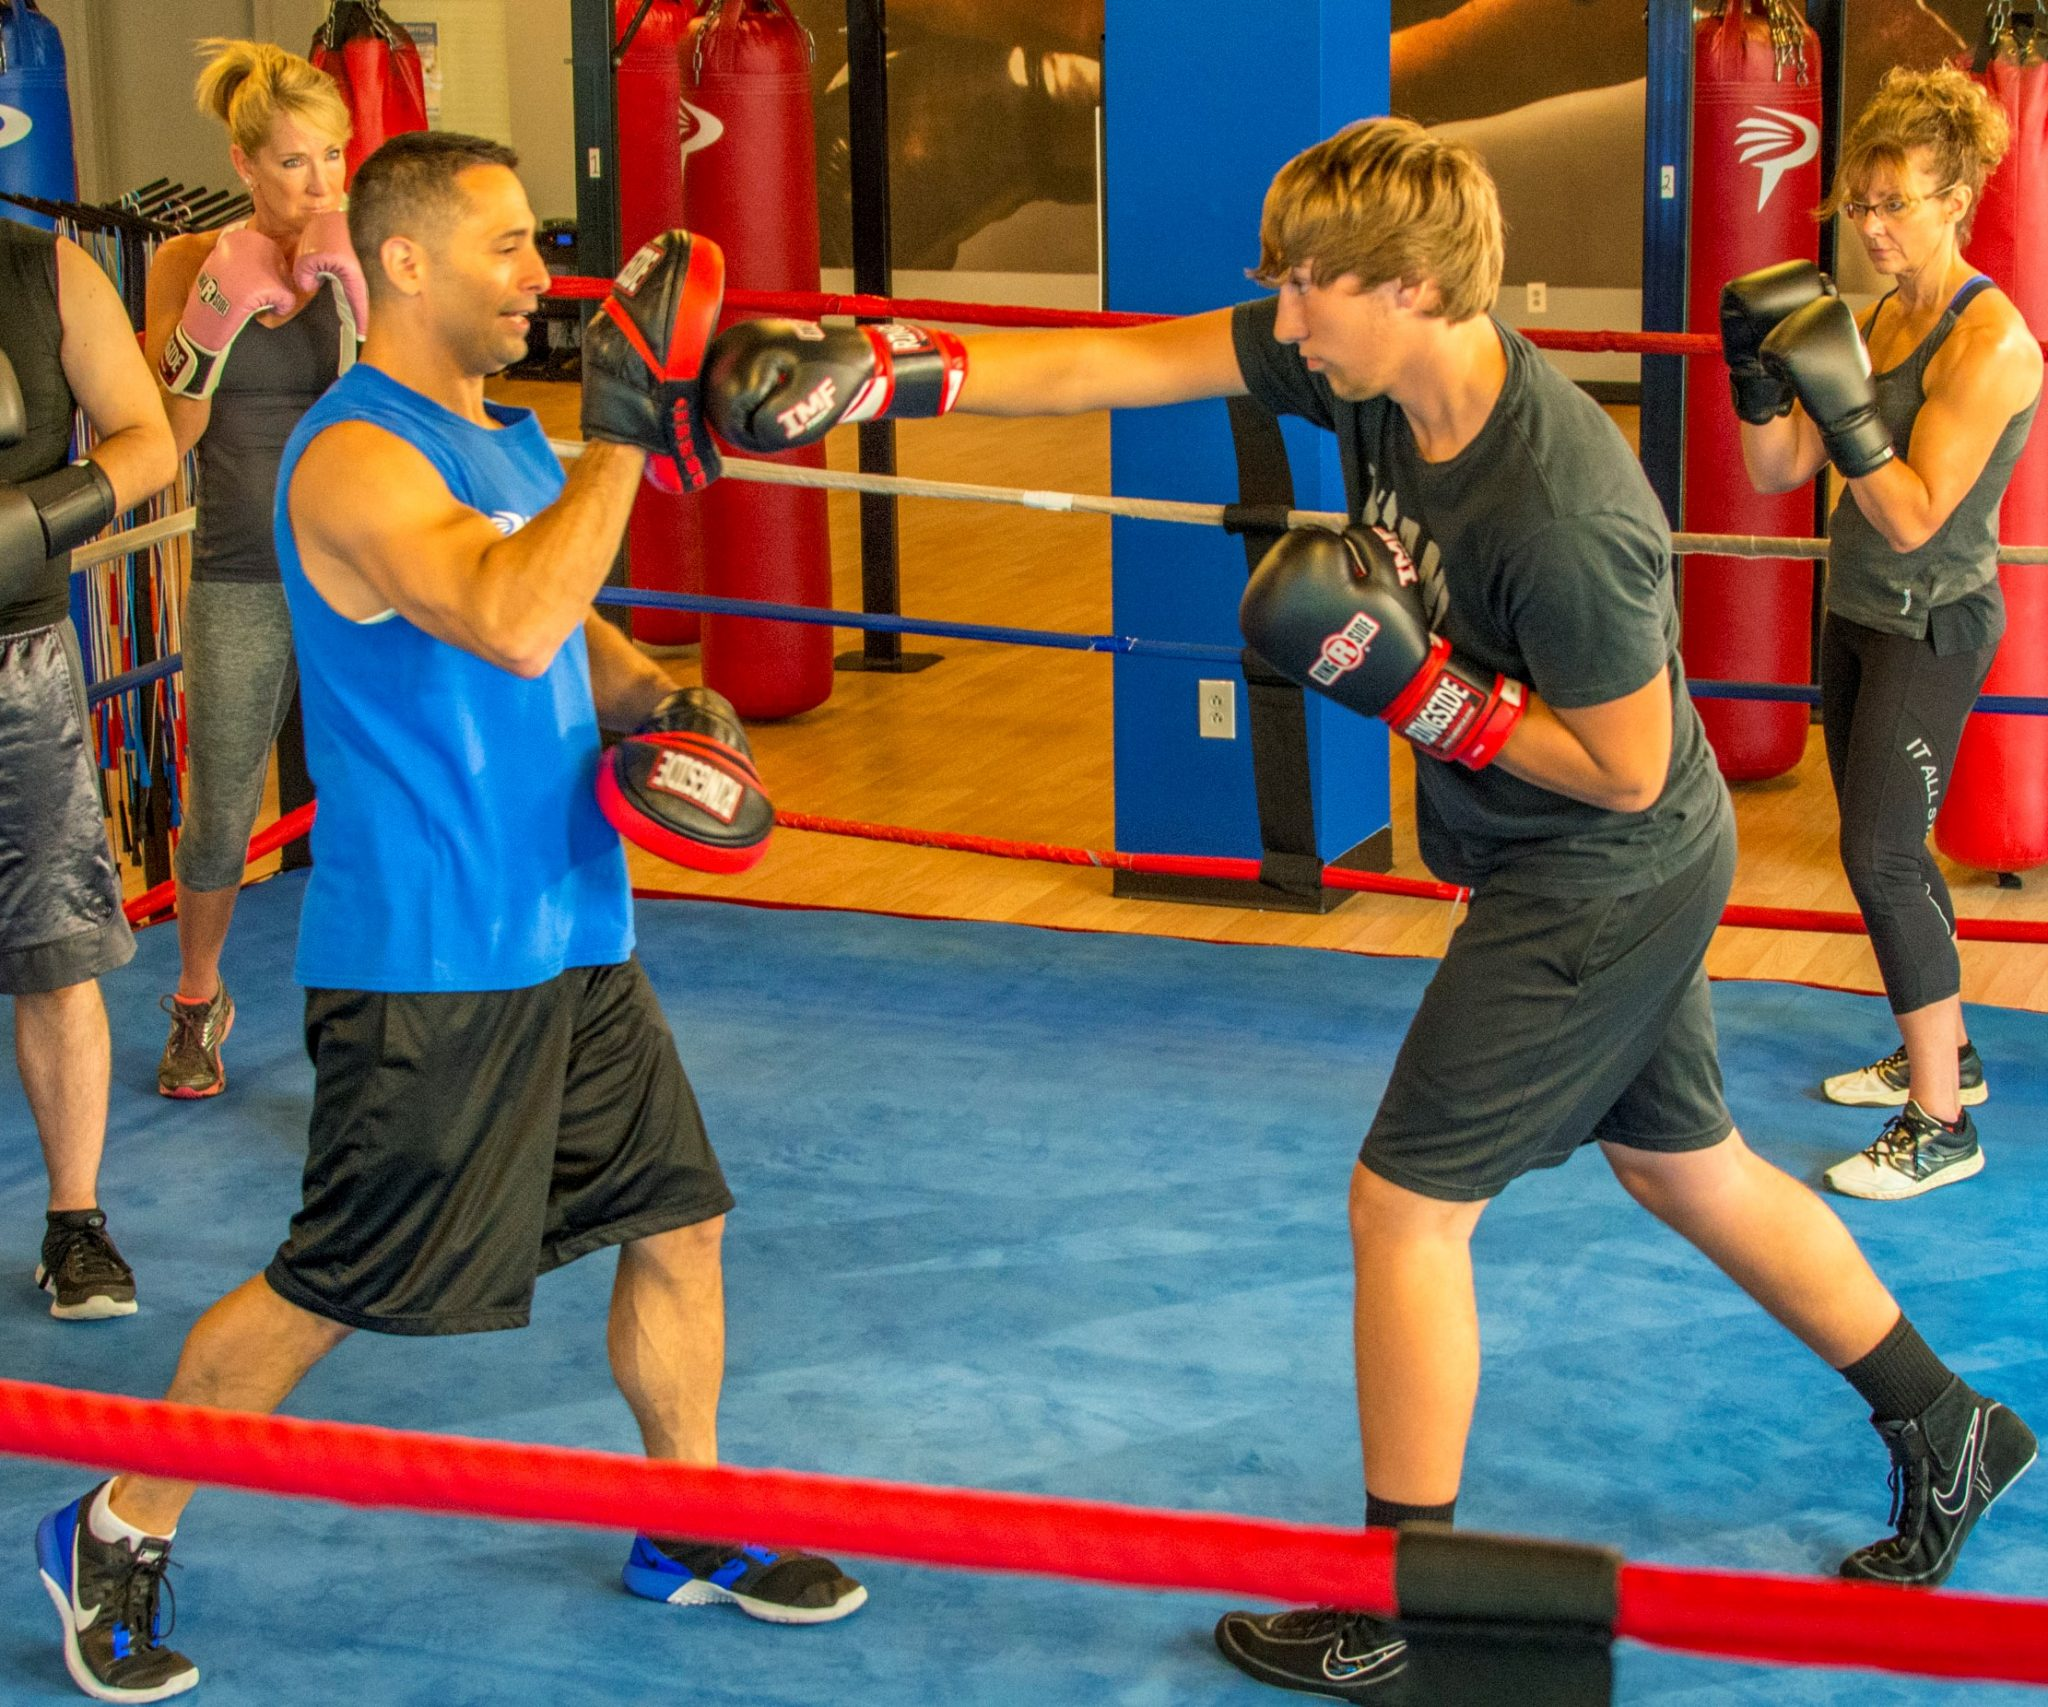 BoxingTraining-1-2048x1707